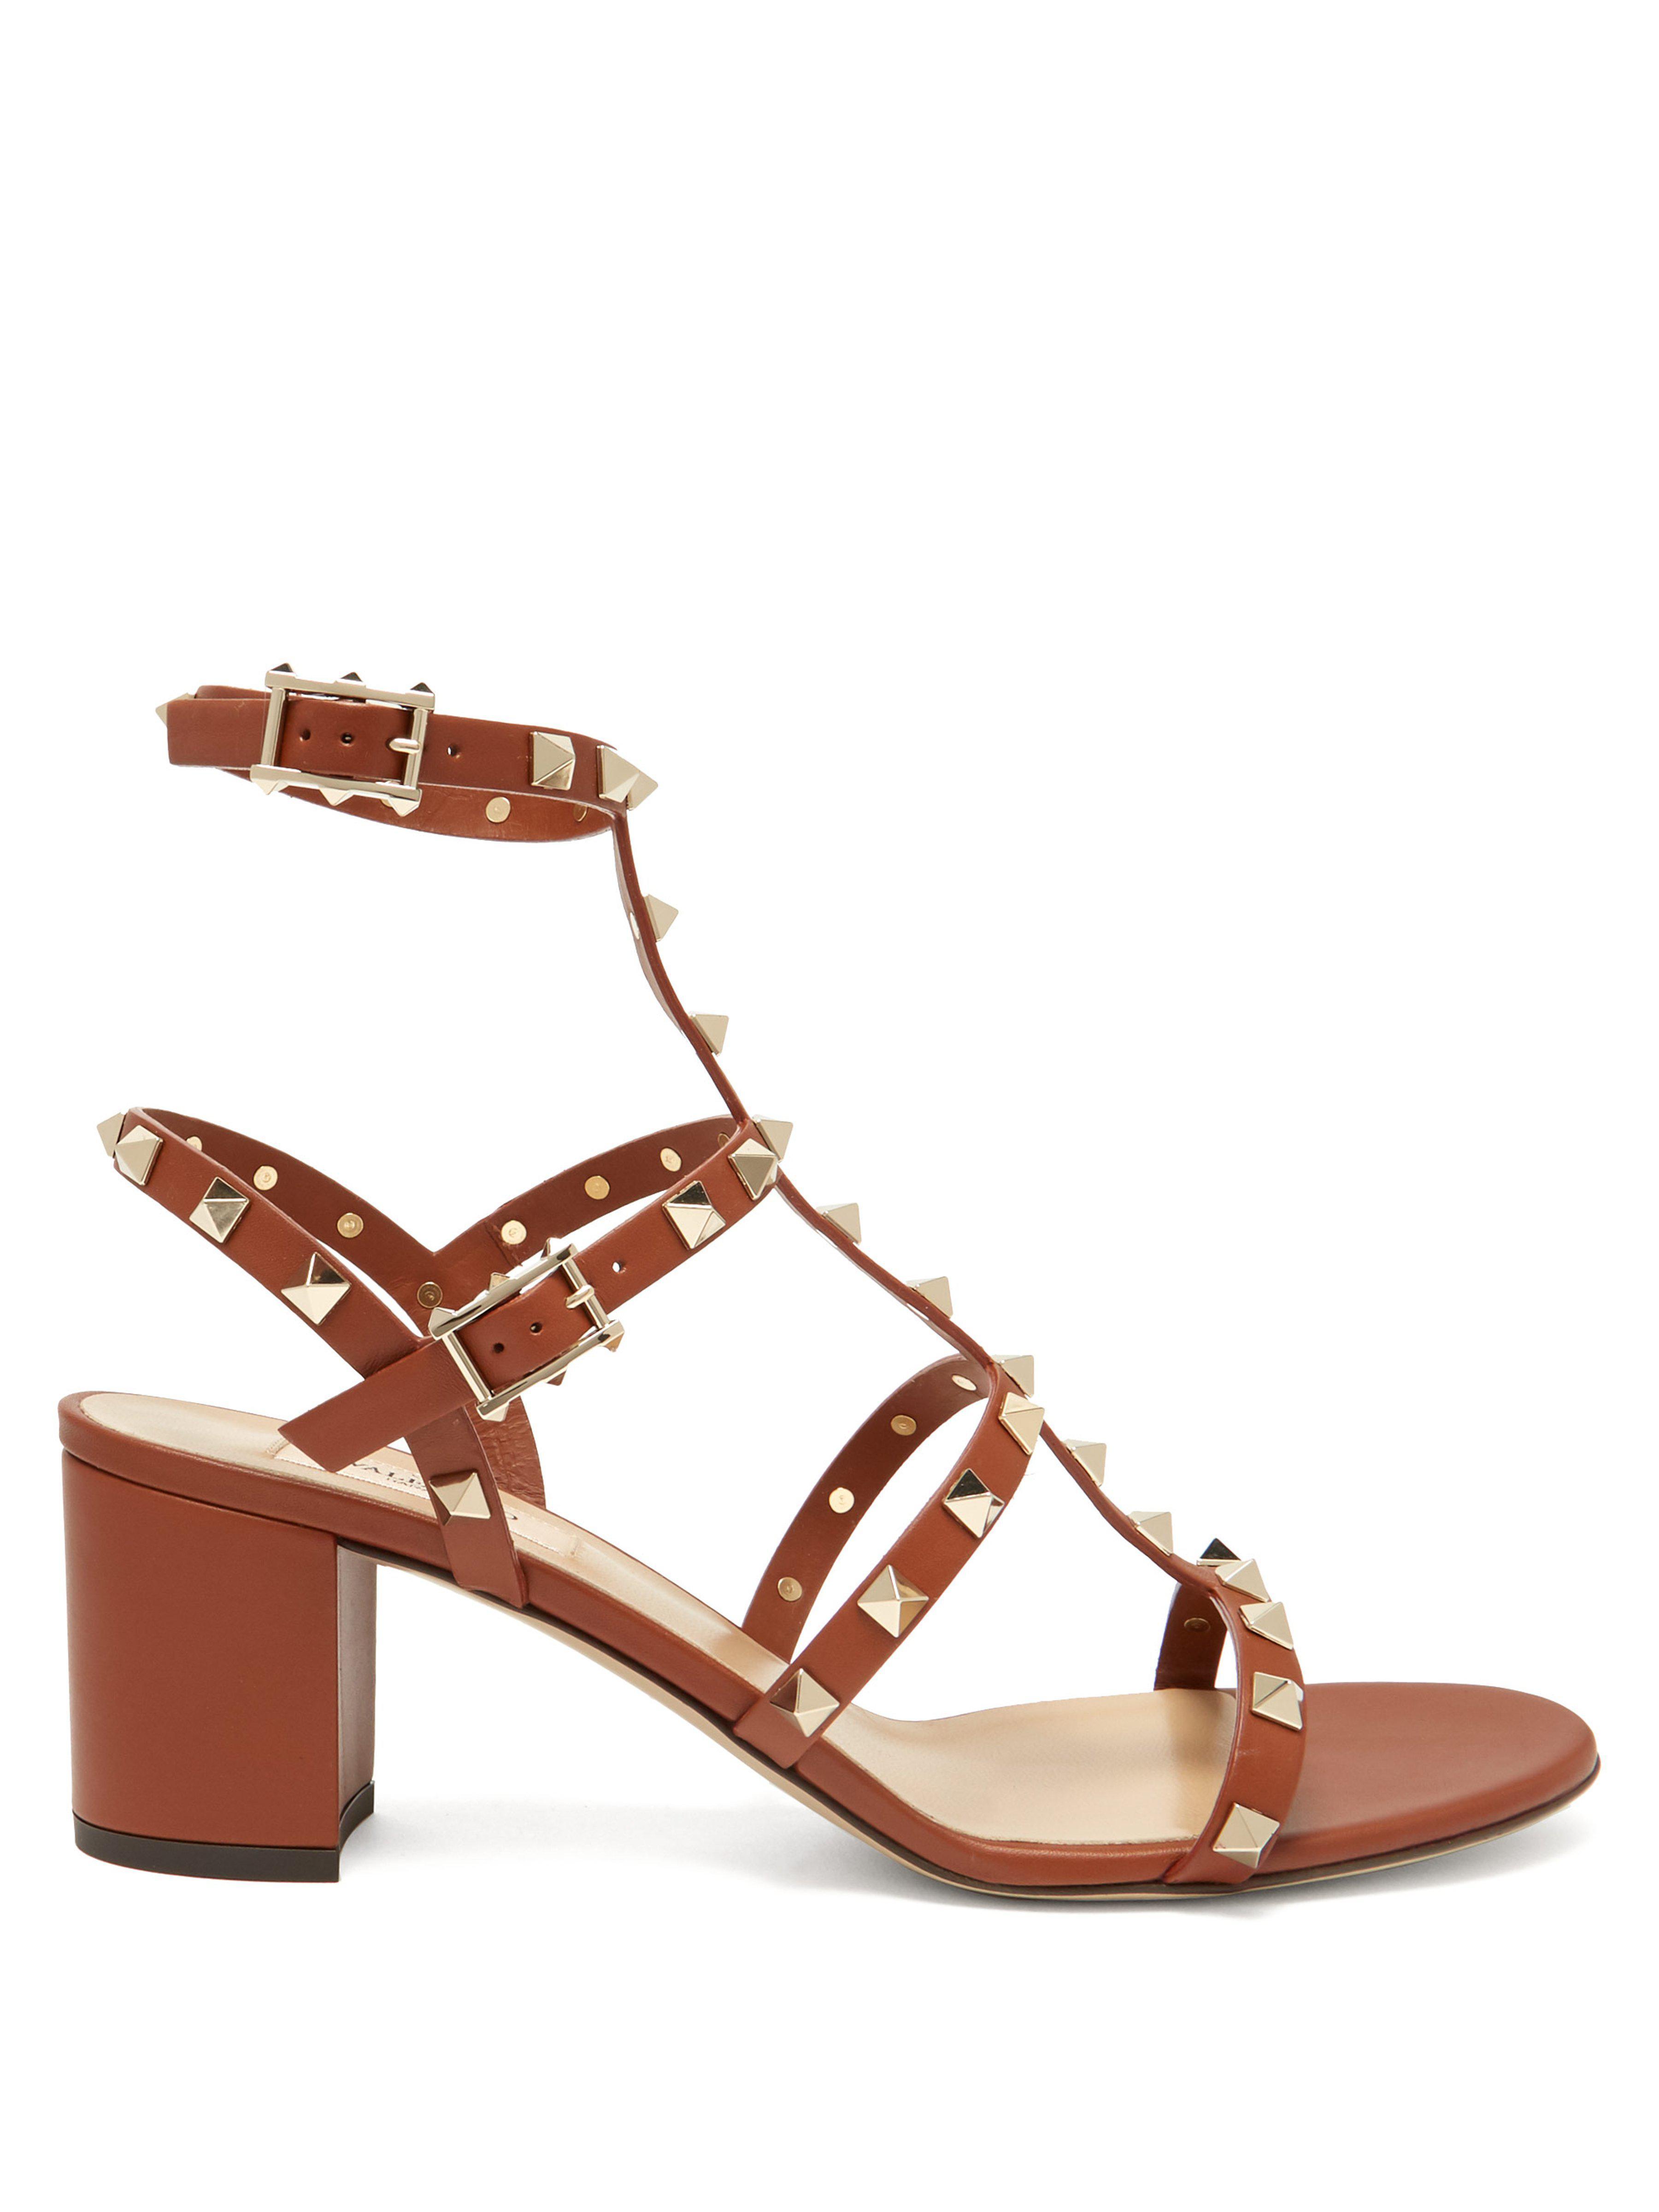 9e2f60e9b87 Valentino Rockstud Block Heel Leather Sandals in Brown - Lyst